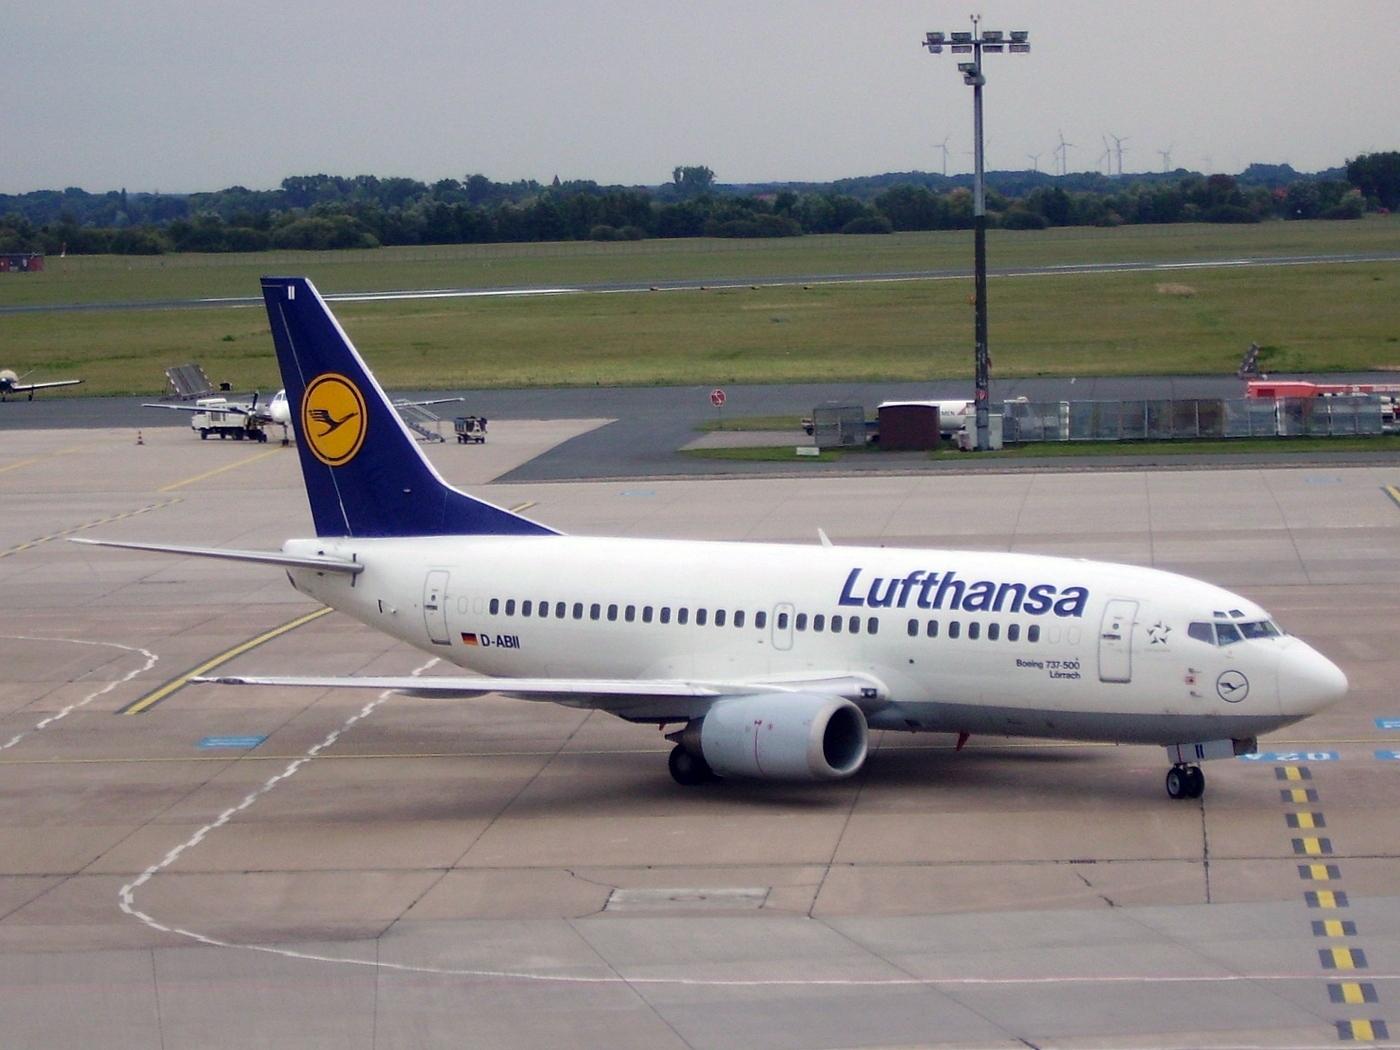 File Lufthansa Boeing 737 500 D Abii Jpg Wikimedia Commons